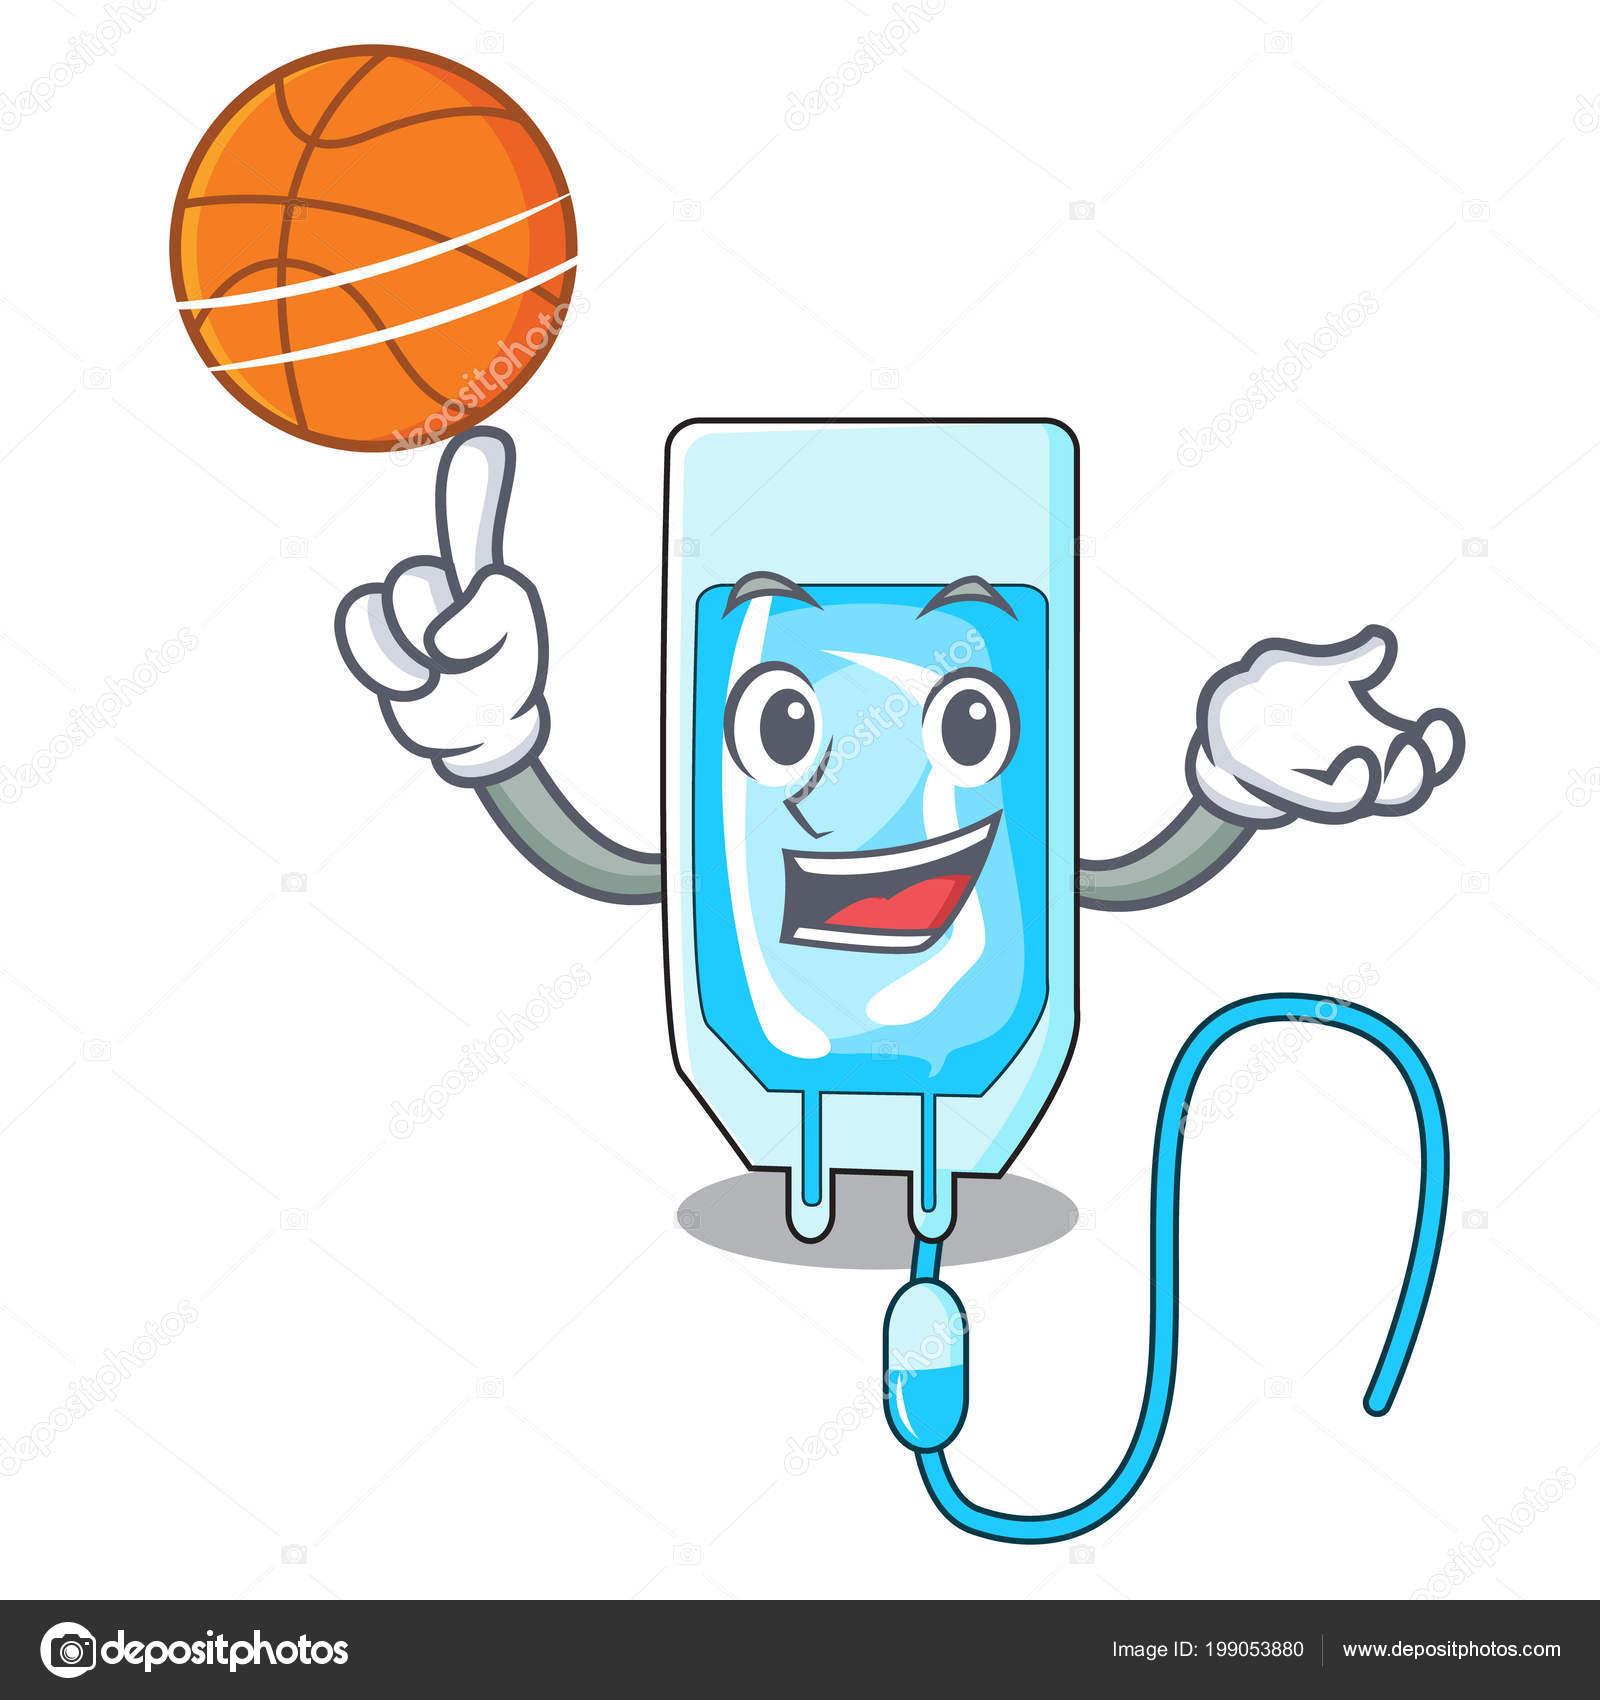 Basketbal Infussion Lahev Charakter Kreslene Vektorove Ilustrace